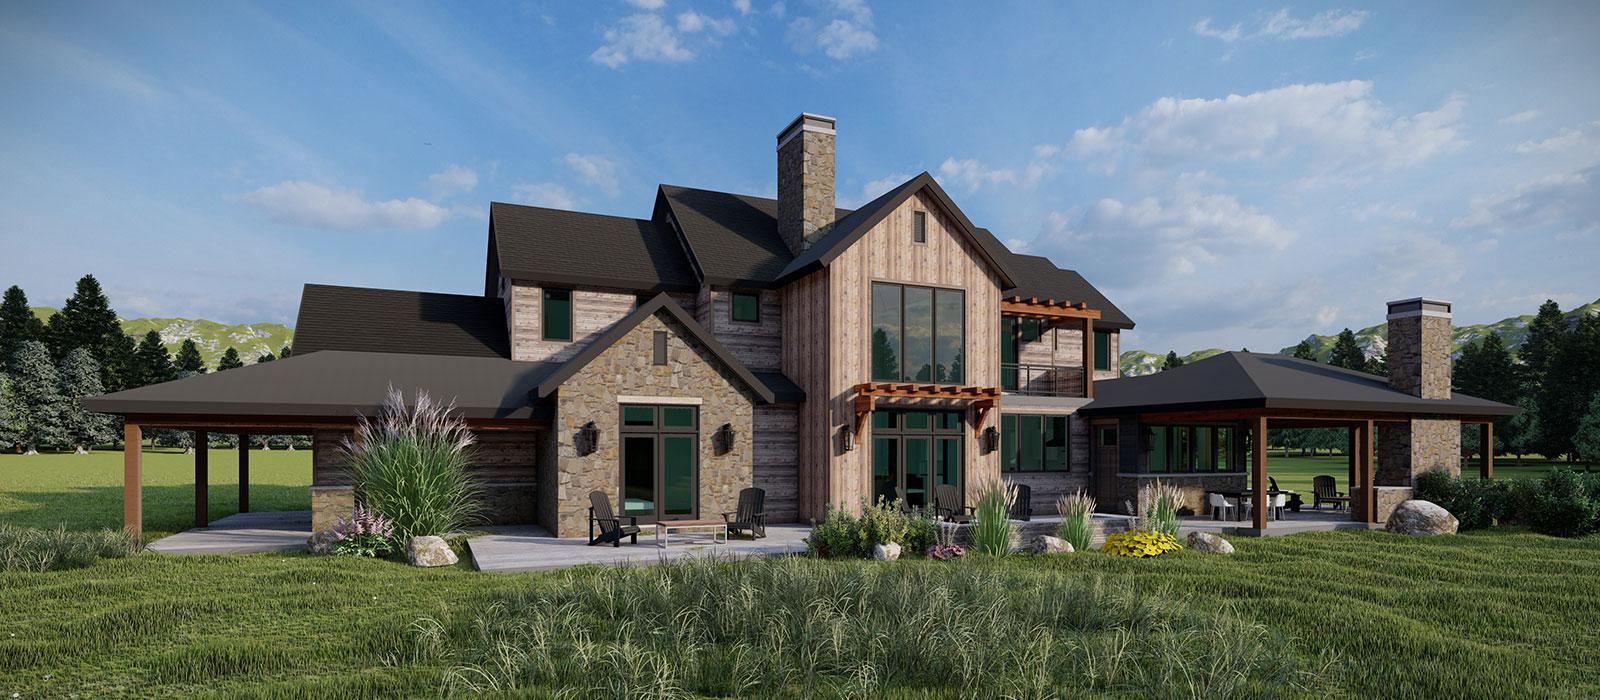 Custom home in Bozeman, Montana designed by KGA Studio Architects